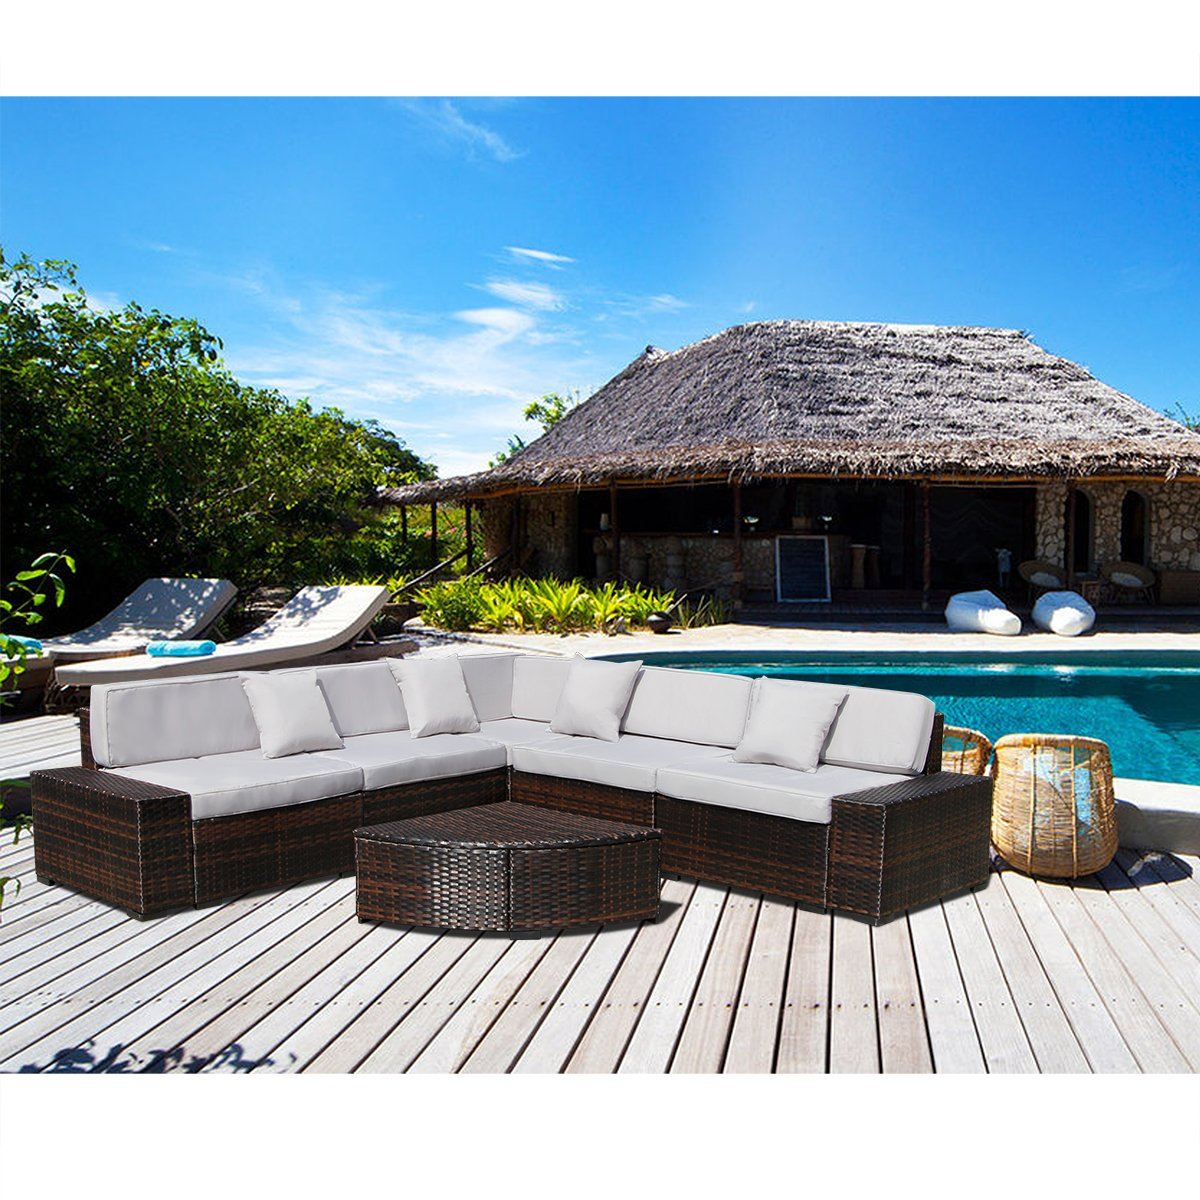 U-MAX 6 Pieces Patio PE Rattan Wicker Sofa Outdoor Sectional Patio Furniture Sets (Brown Rattan+Grey Pillows)